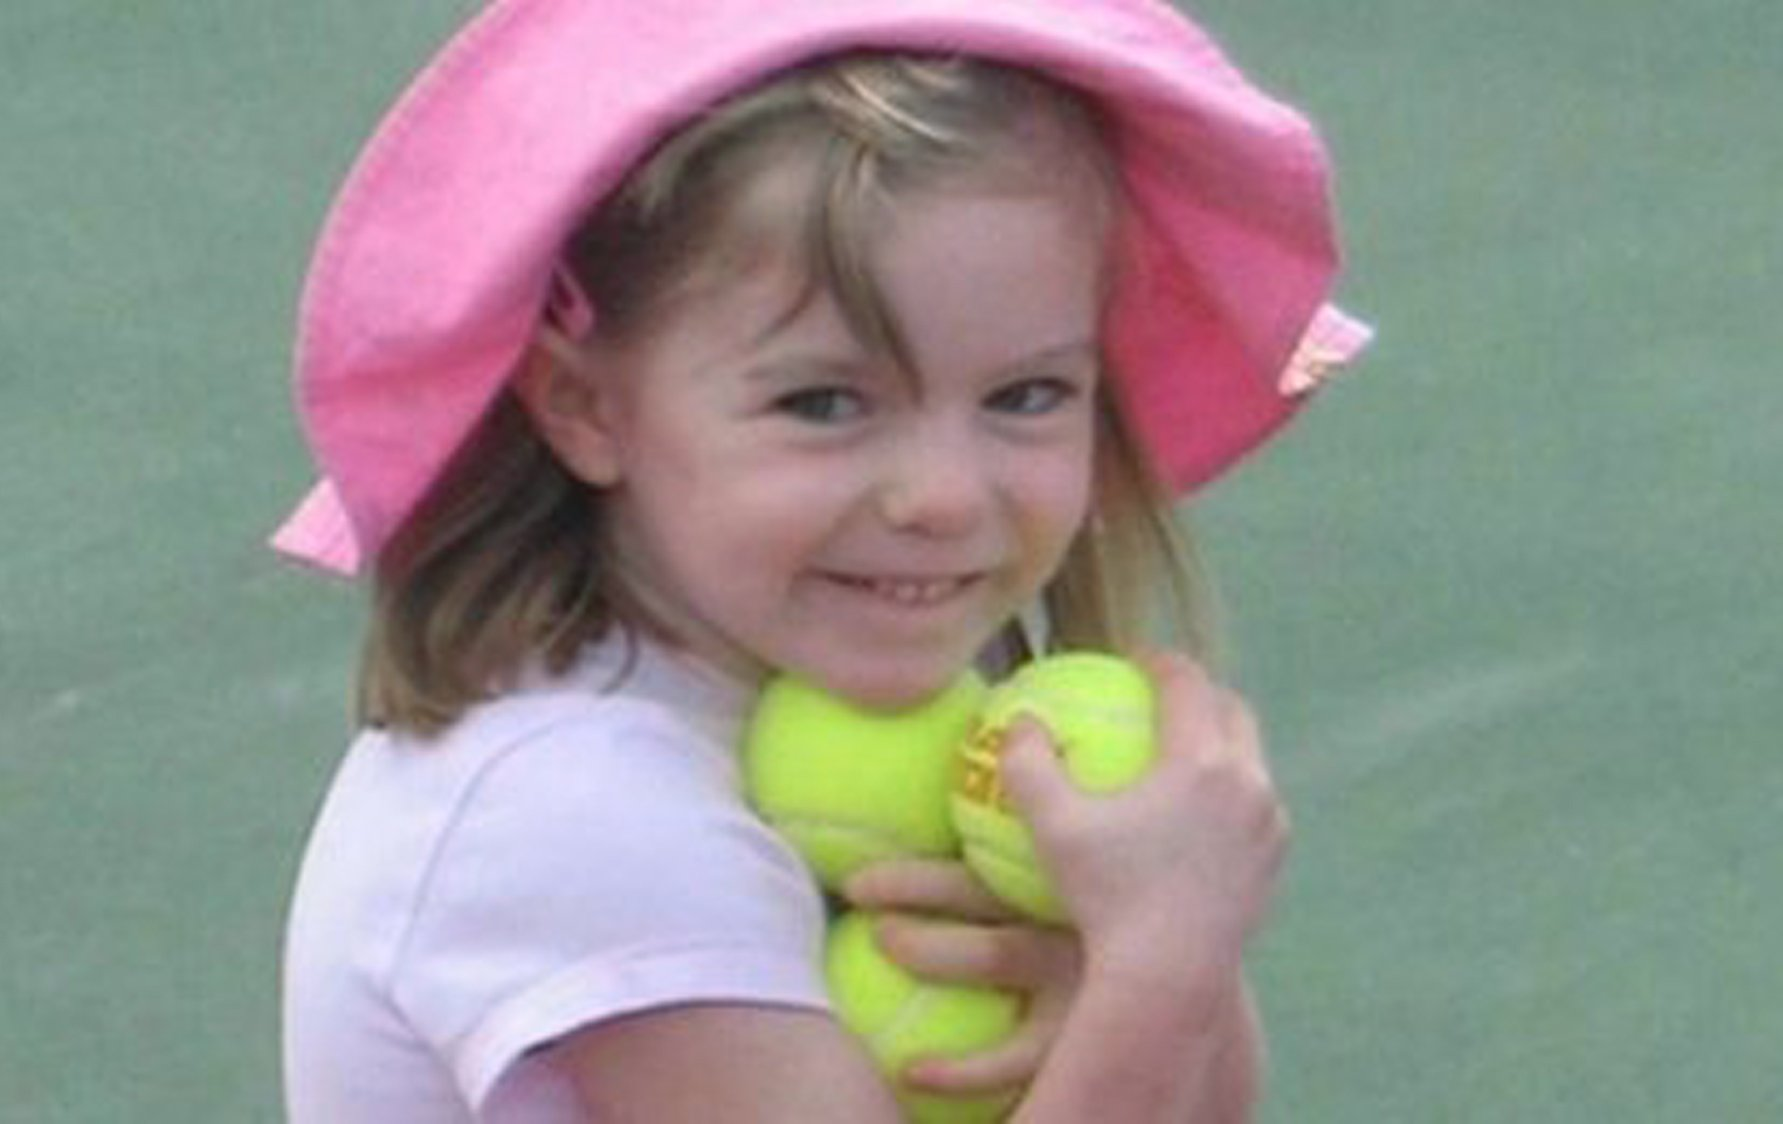 Madeleine McCann Investigators Contact Australian Police Over Suitcase Body